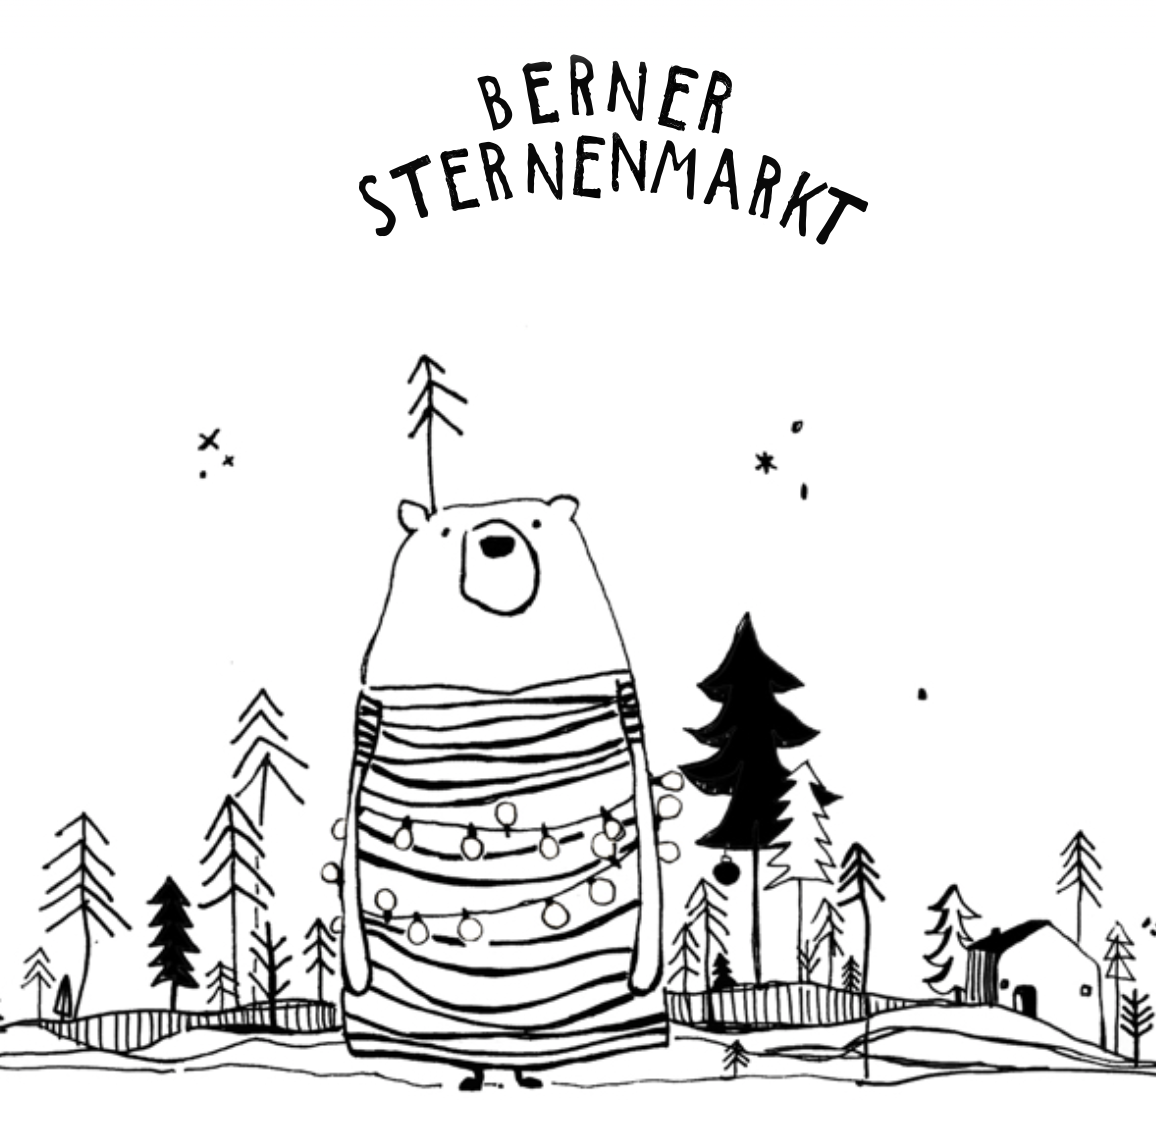 Berner Sternenmarkt 29.11. – 12.12.2018